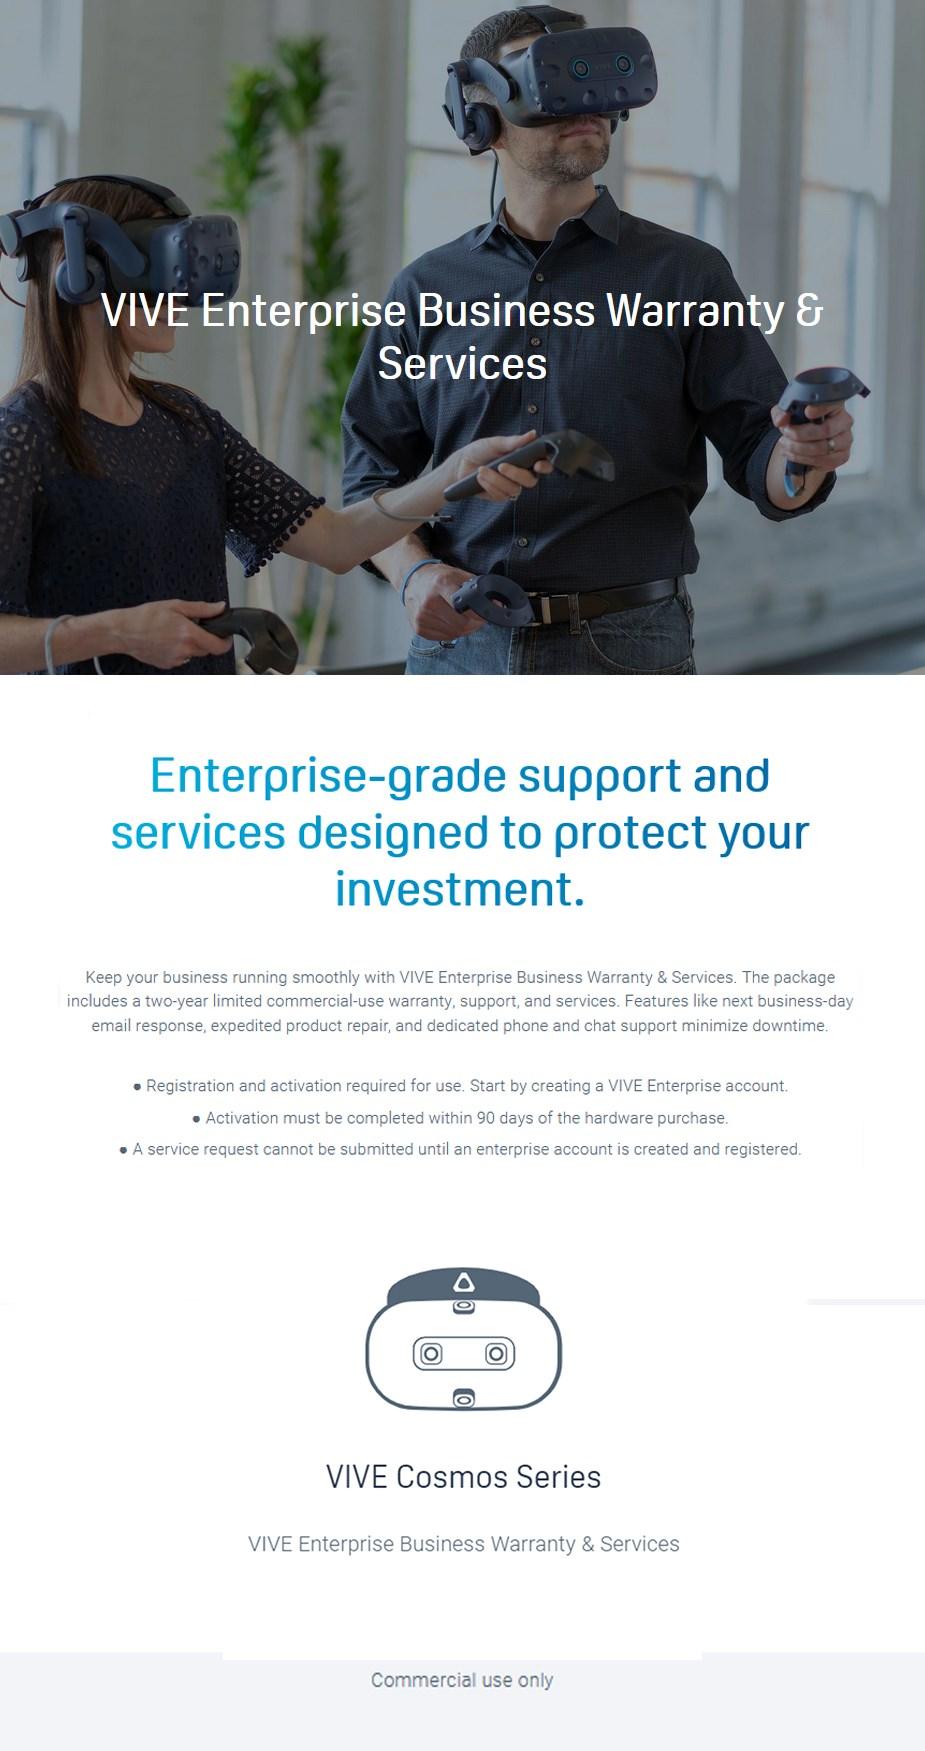 HTC Advantage Enterprise Care Package for VIVE Cosmos Series - Commercial Use - Desktop Overview 1